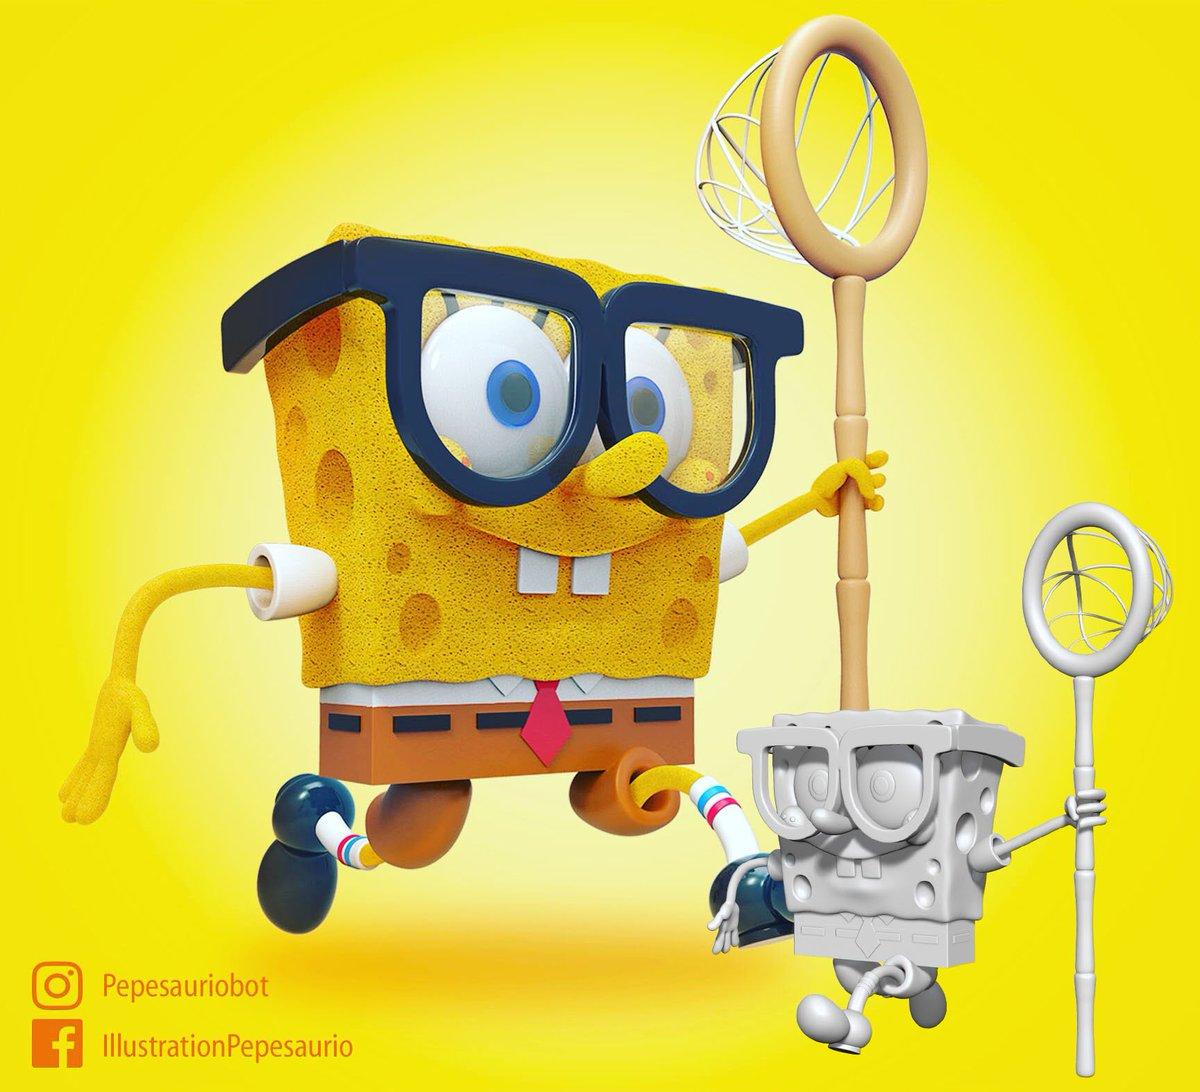 Bob!  Repost cuz obviously XD Part 2 :p  #characterdesigner  #conceptart  #illustration  #2D  #3D  #games  #zbrush  #gameartwork  #ZBrush  #3D  #Toon  #Cartoon  #characters  #studio  #ZBrushModel  #Sculpture  #Render  #app  #Gamer  #design  #3DGeneralist  #spongebob  #spongebobsquarepants  #nickelodeon